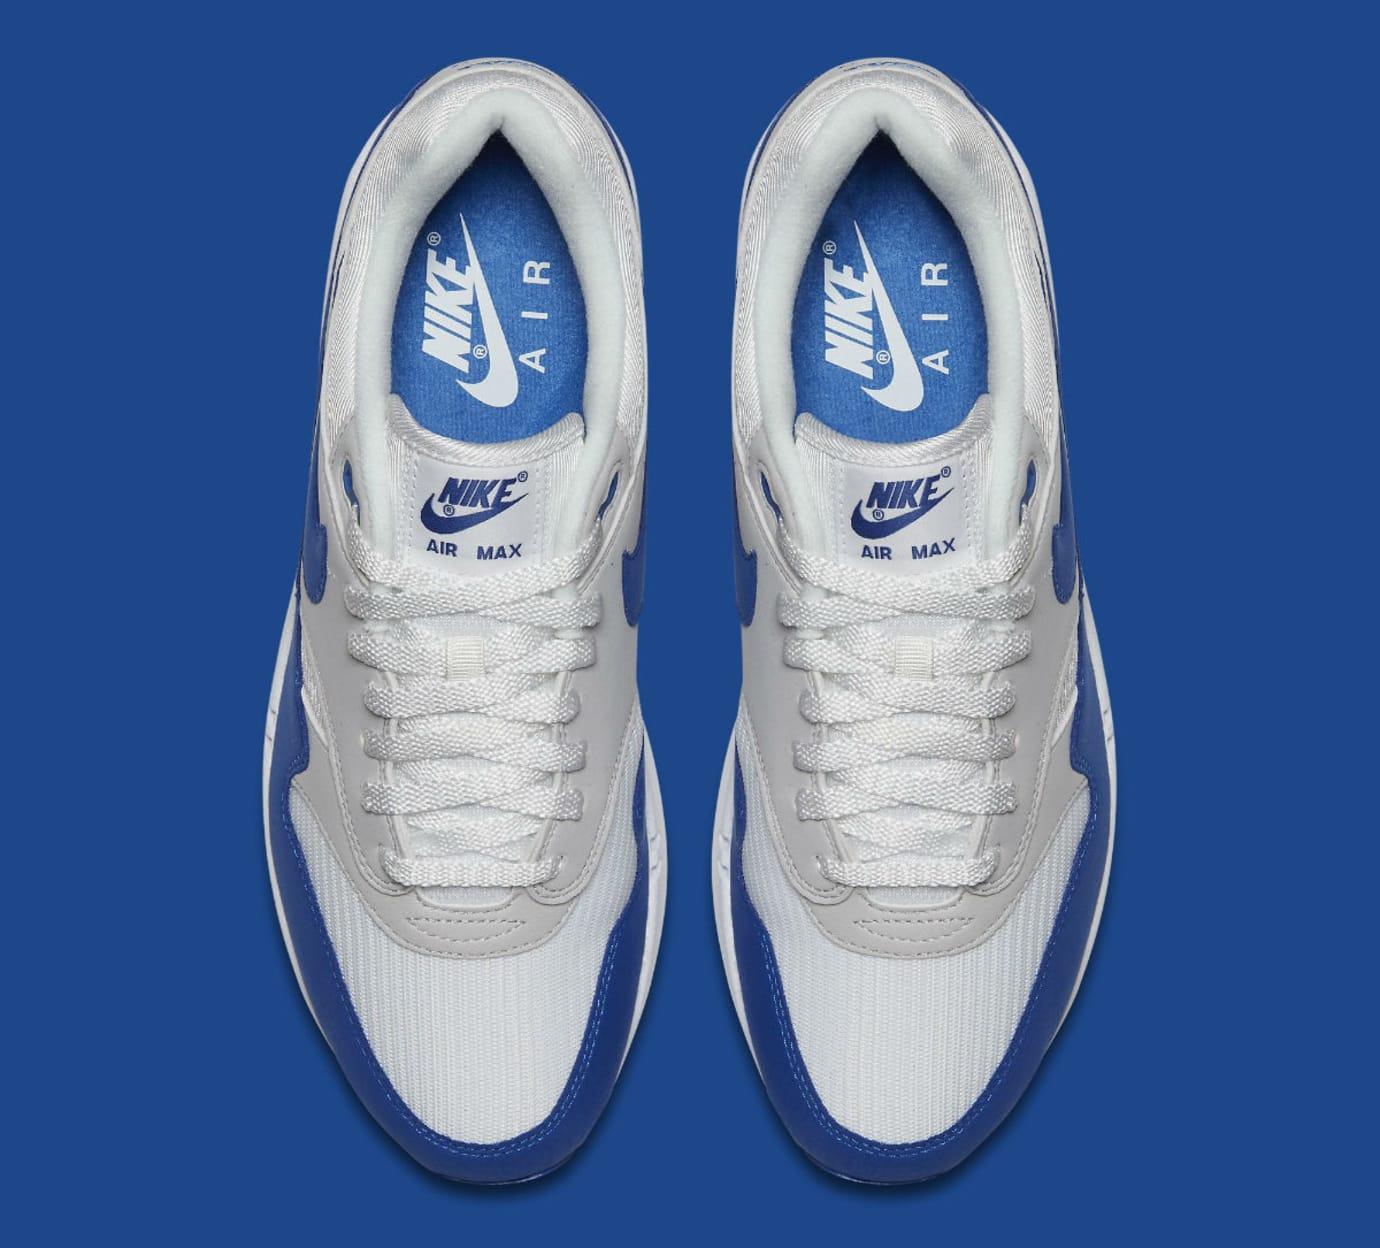 Nike Air Max 1 Anniversary Royal Release Date Top 908375-101